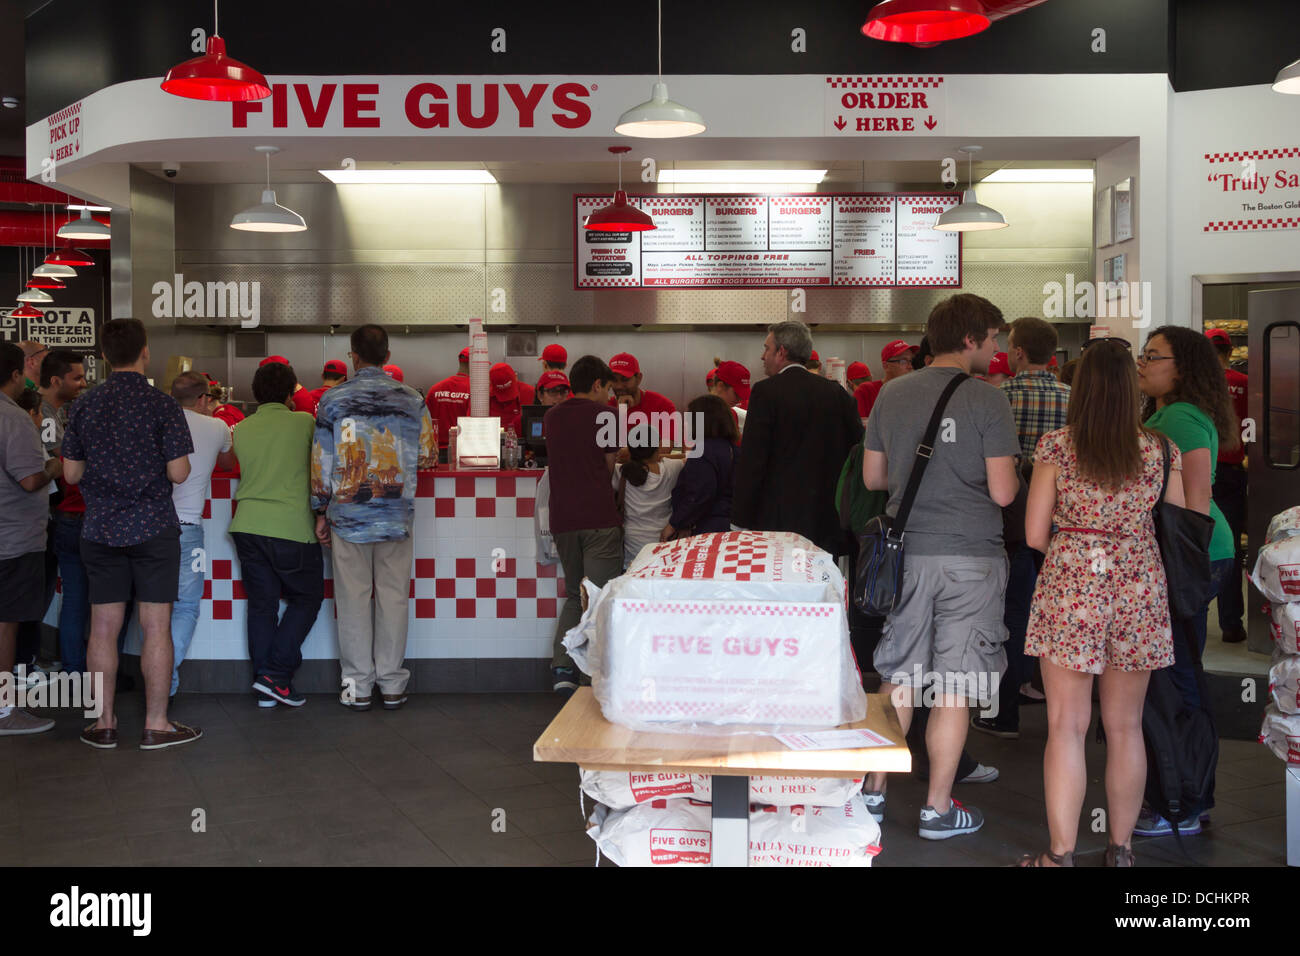 Five Guy's Burger Restaurant - Covent Garden - London - Stock Image